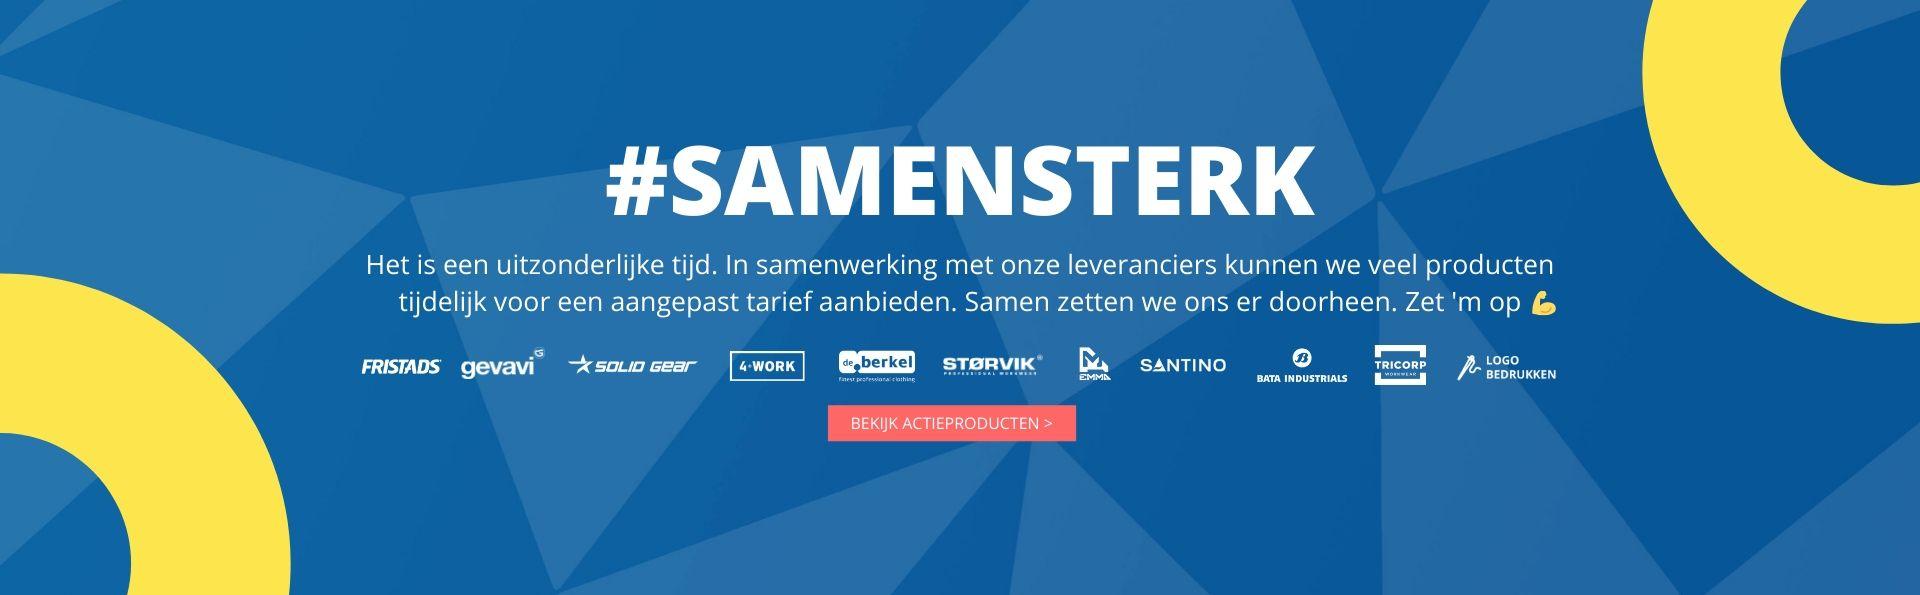 20200325 - SamenSterk